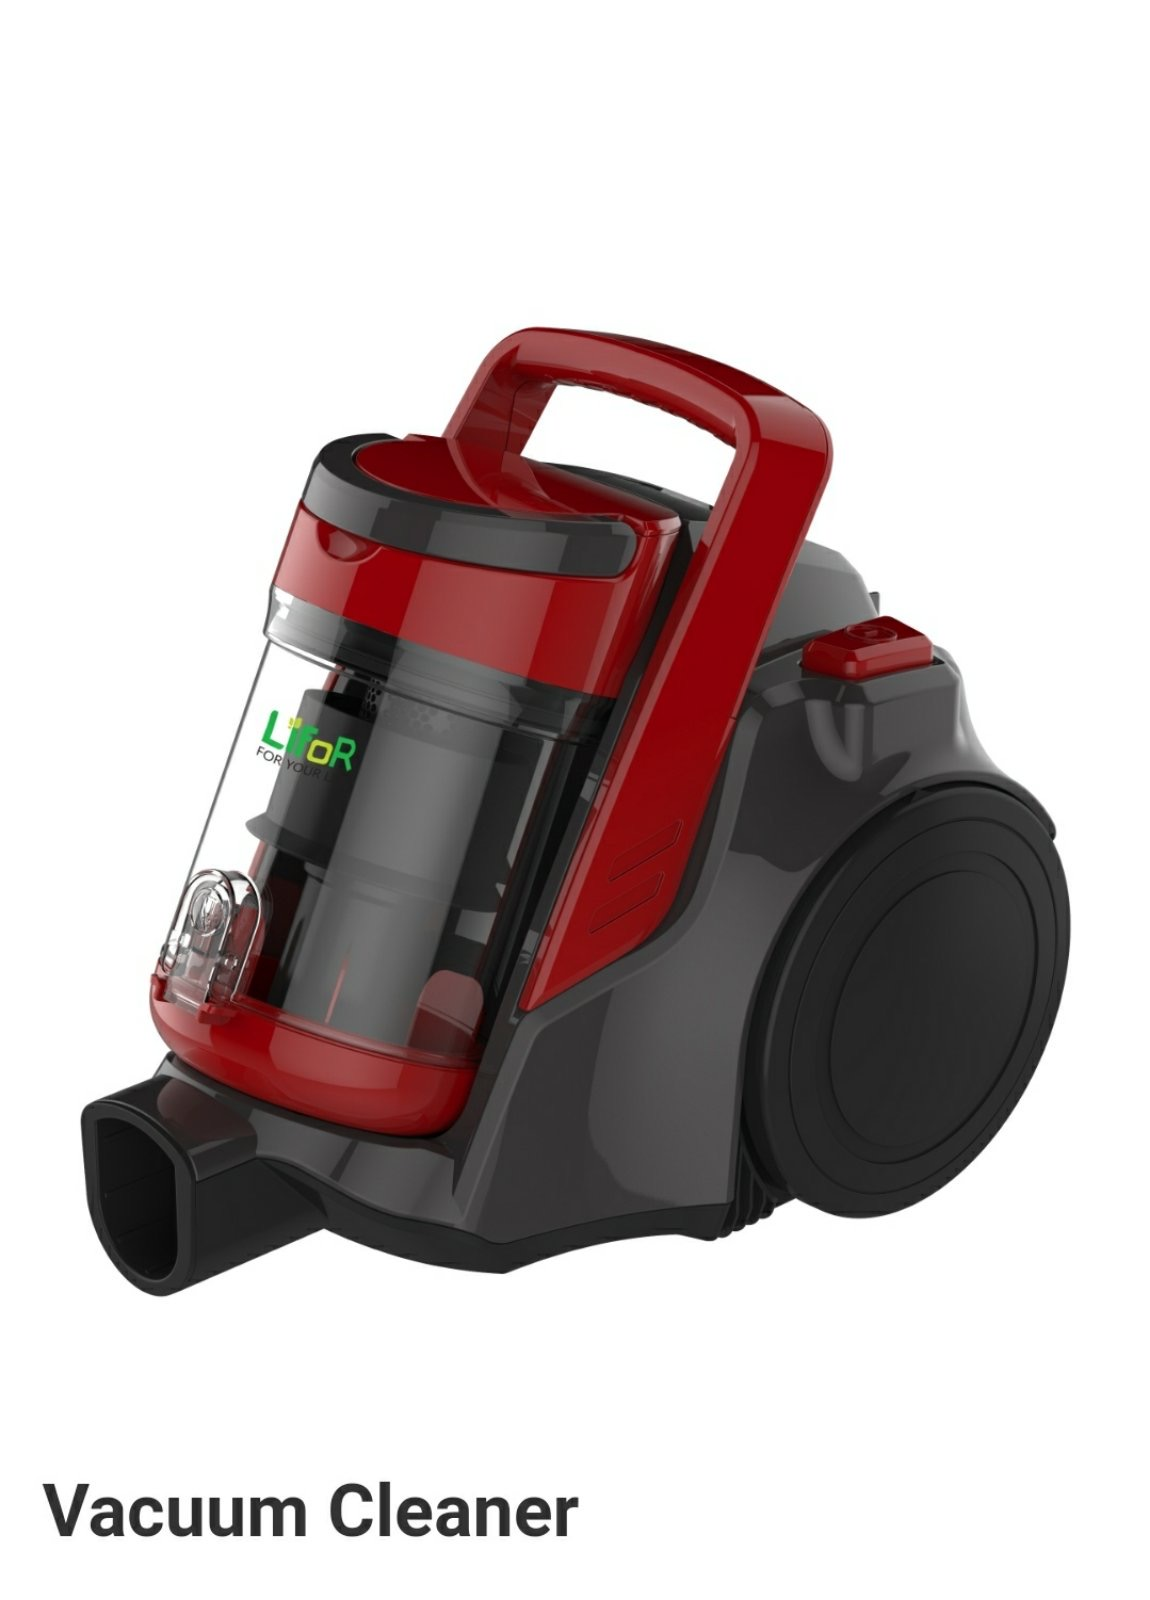 Lifor Vacuum cleaner -Bagless